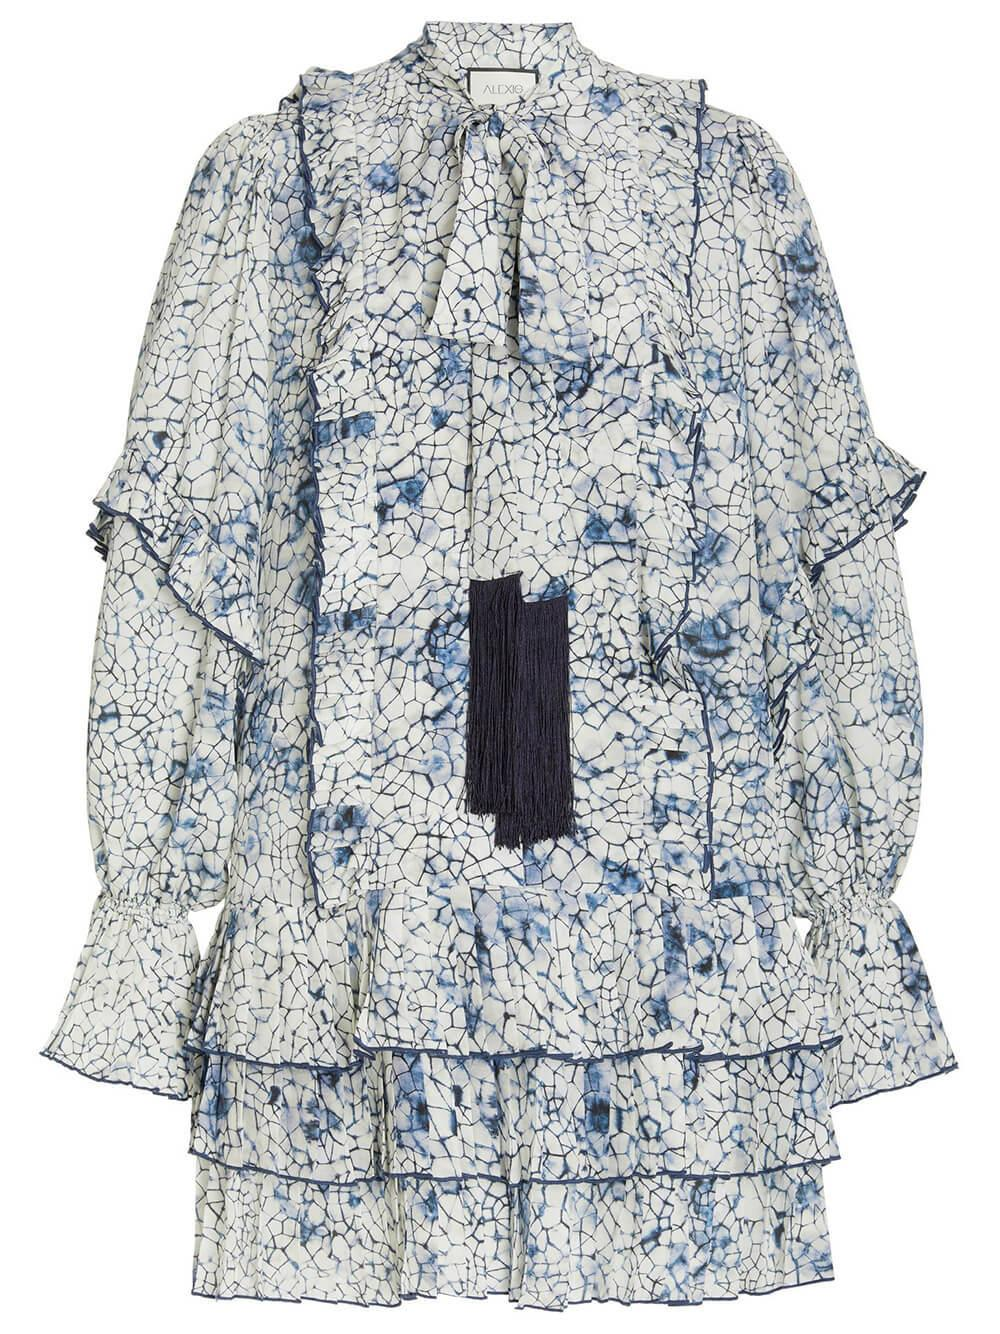 Fortune Mini Dress Item # A3210310-7388